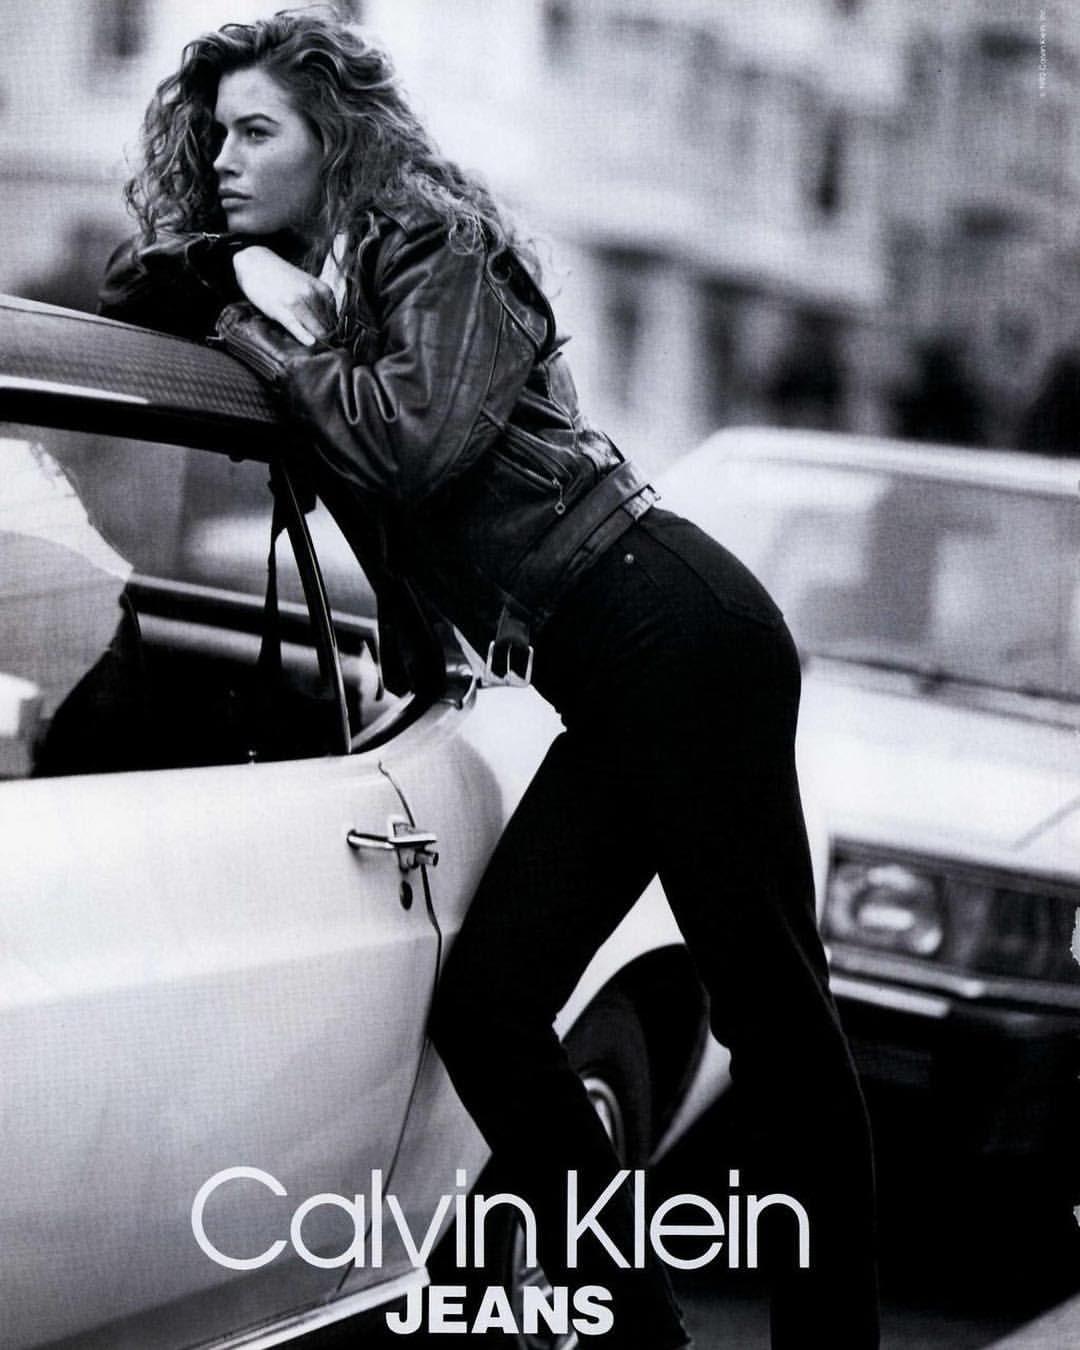 Calvin Klein Jeans 1991: Carré Otis, Marcus Schenkenberg ...  Marcus Schenkenberg Calvin Klein Ad